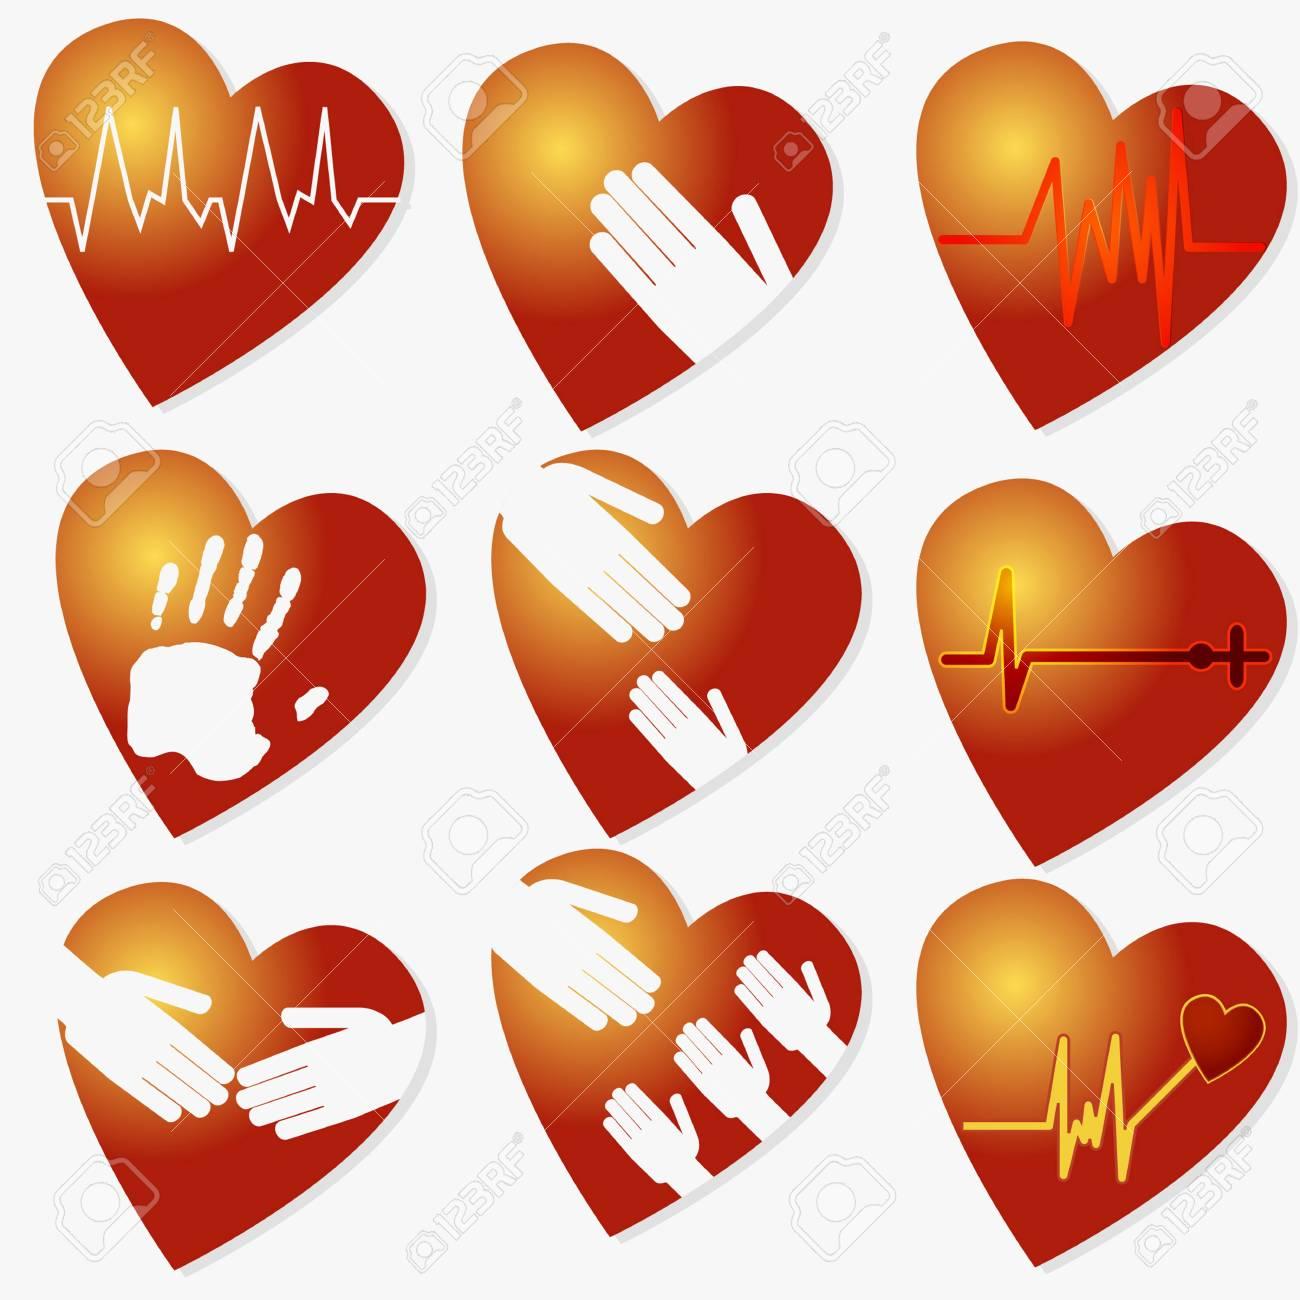 heart Stock Vector - 14151367